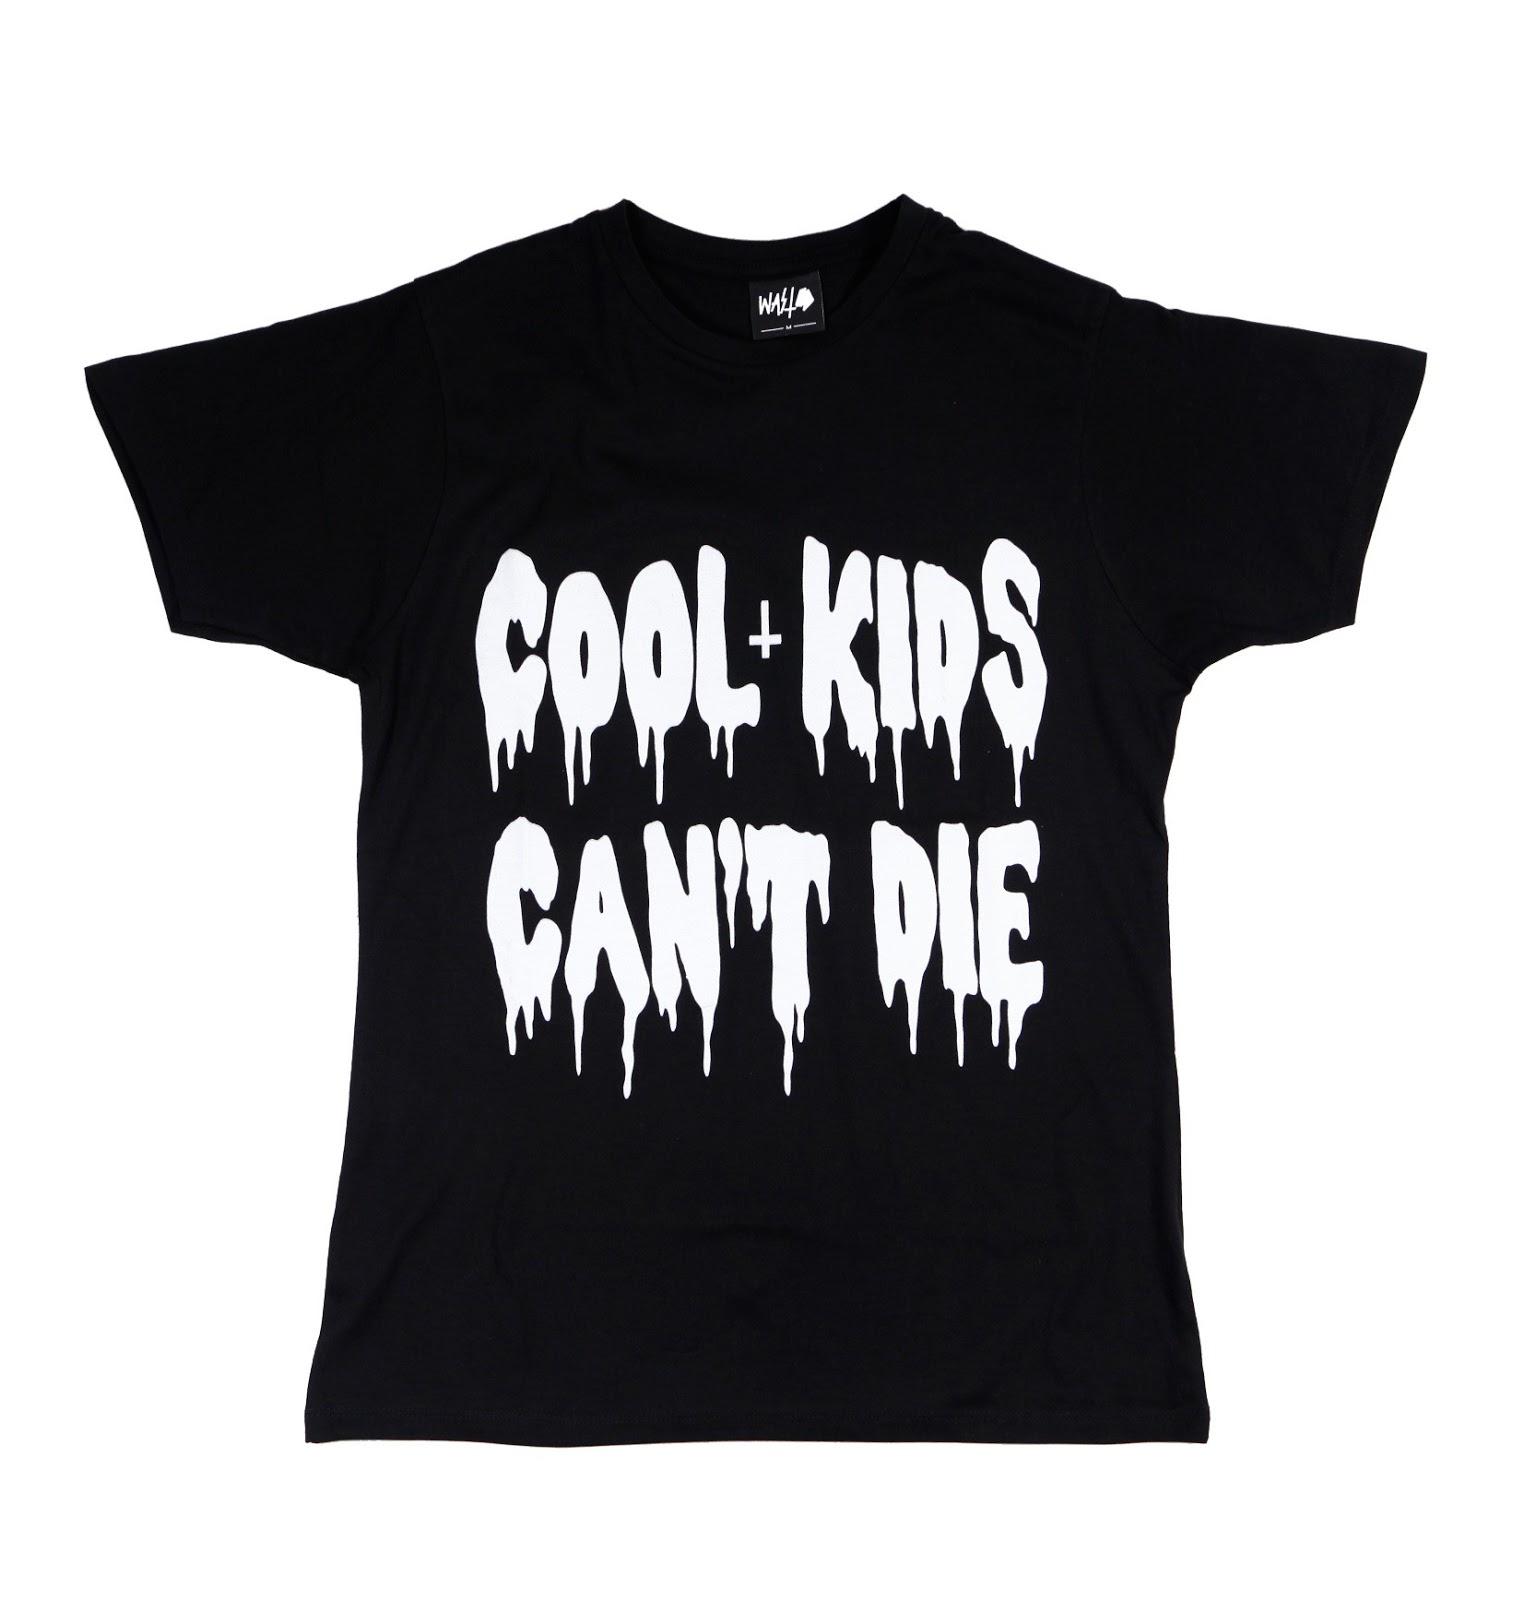 https://grafitee.es/s/camisetas/712-tshirt-cool-kids-can-t-die.html